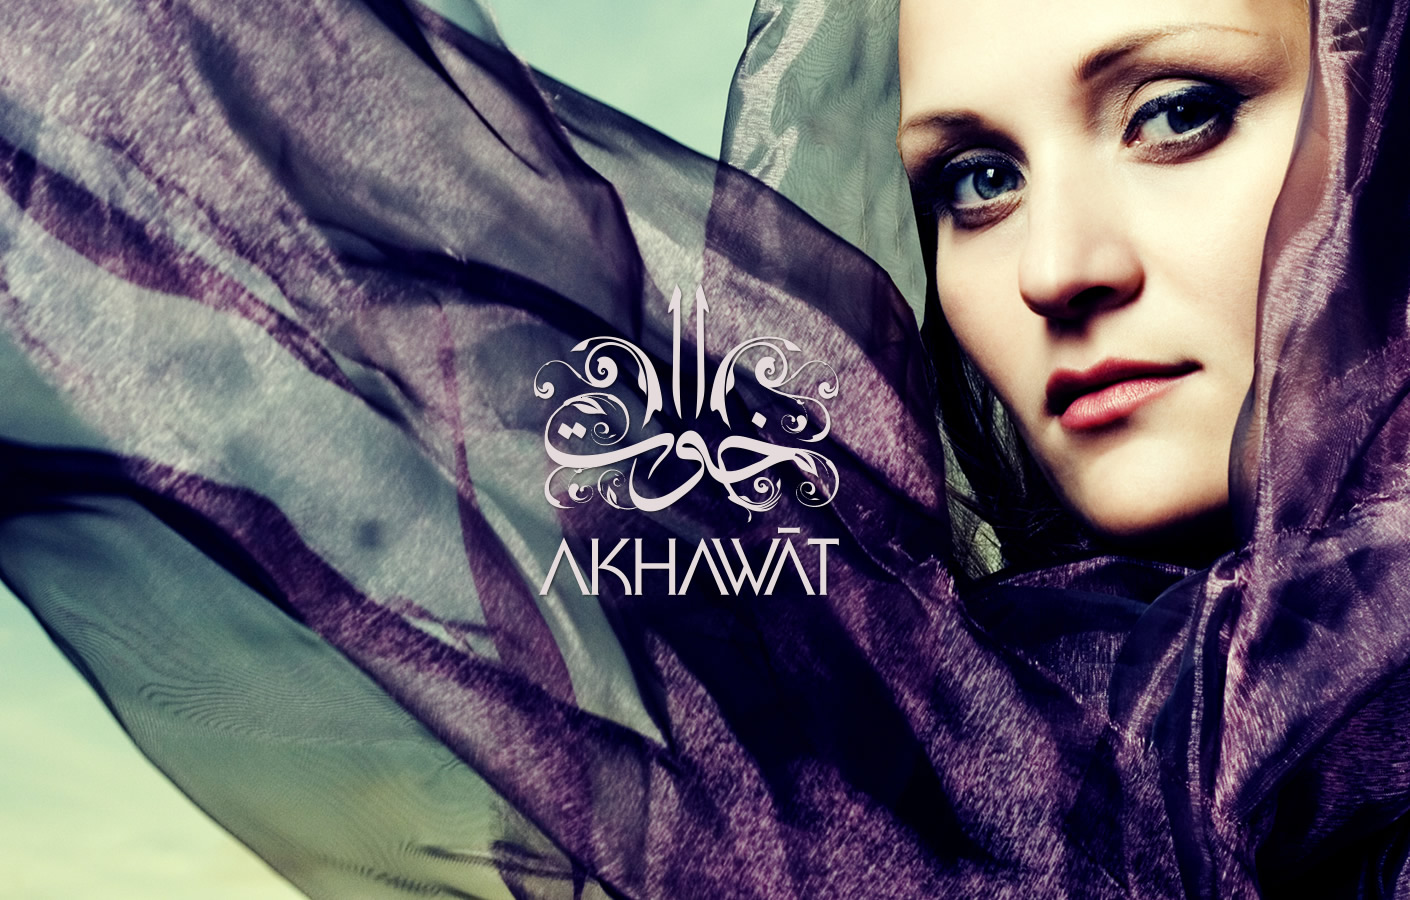 akhawat-big1